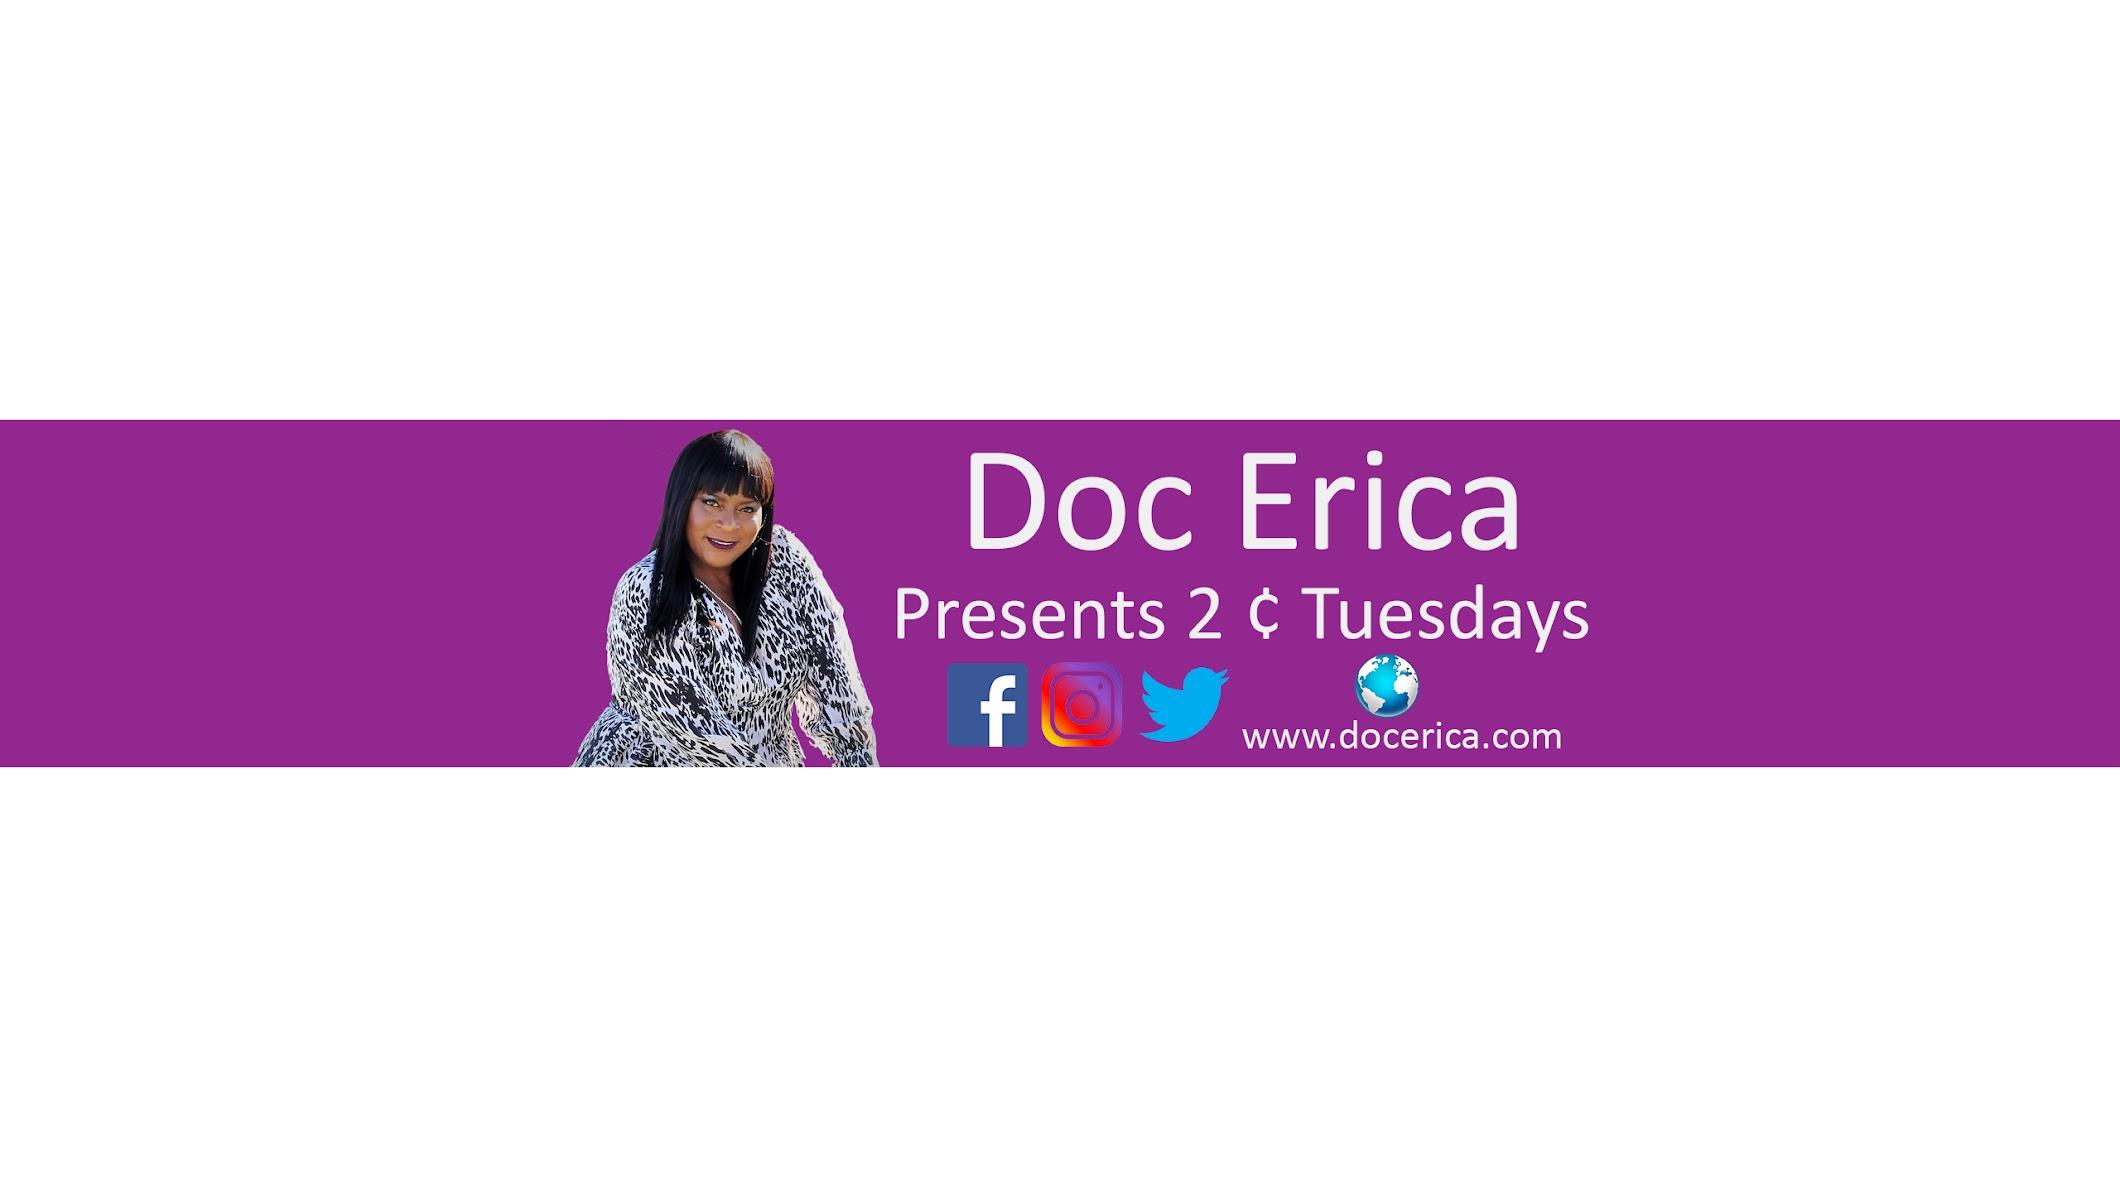 Doc Erica